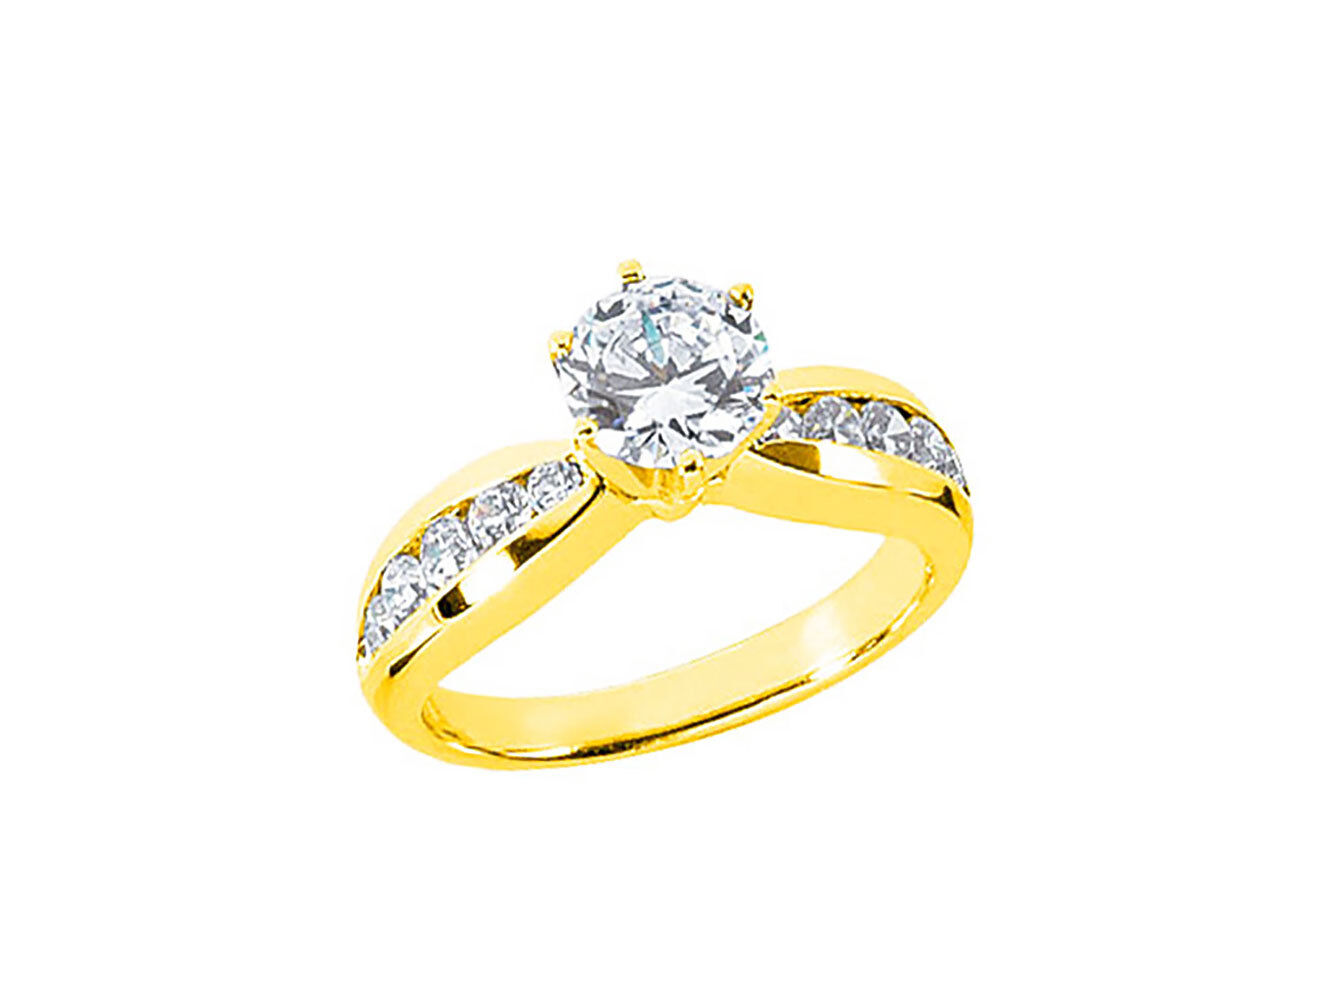 0.90Ct Round Cut Diamond Ladies Bridal Engagement Ring Solid 18k gold G SI1